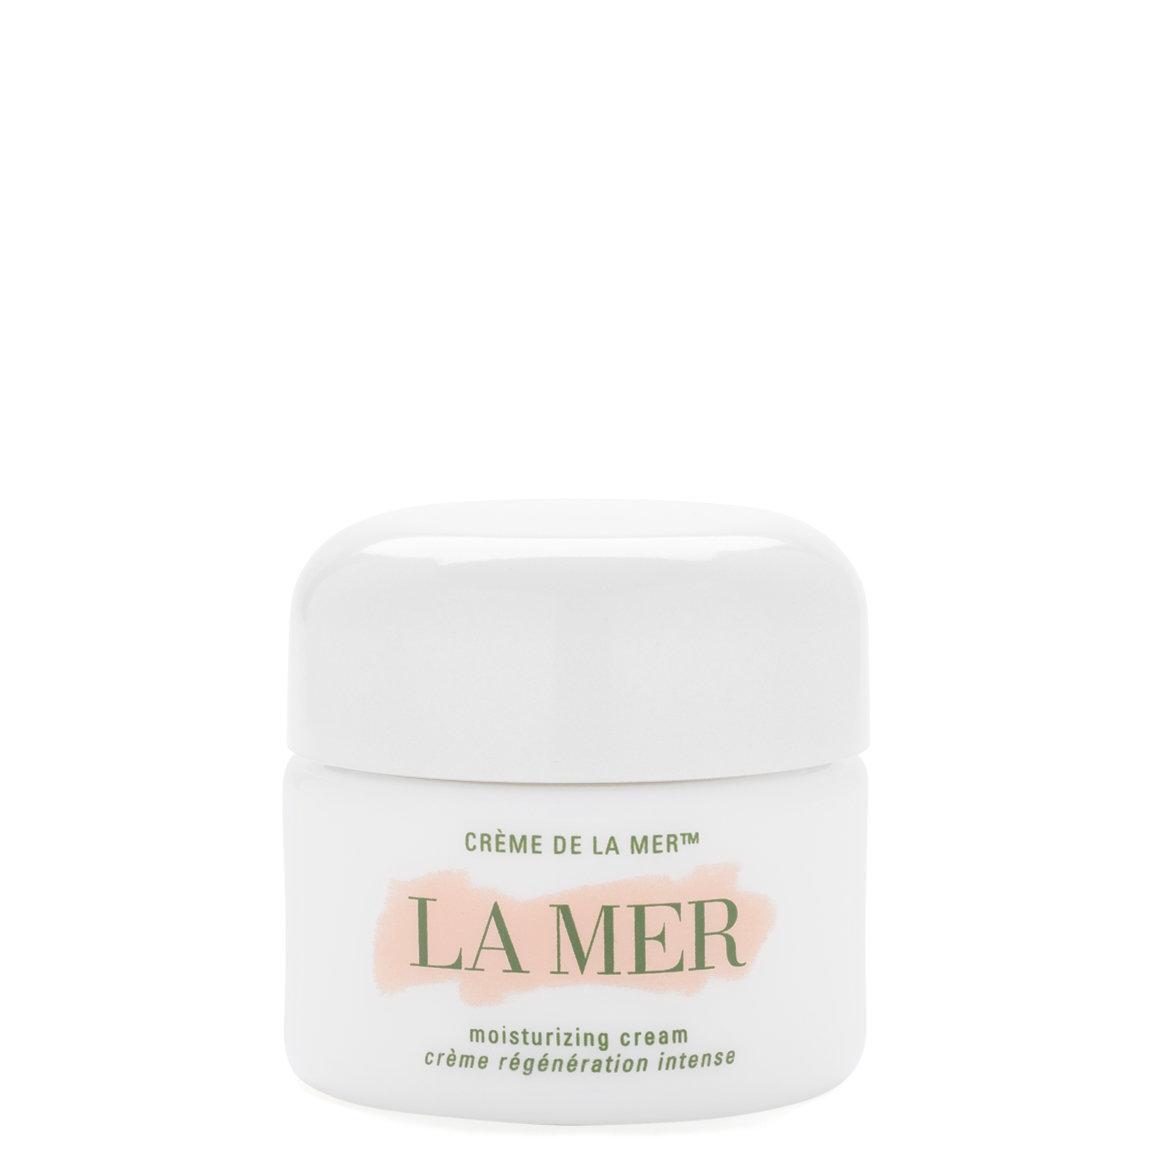 La Mer Crème De La Mer 1 oz product swatch.